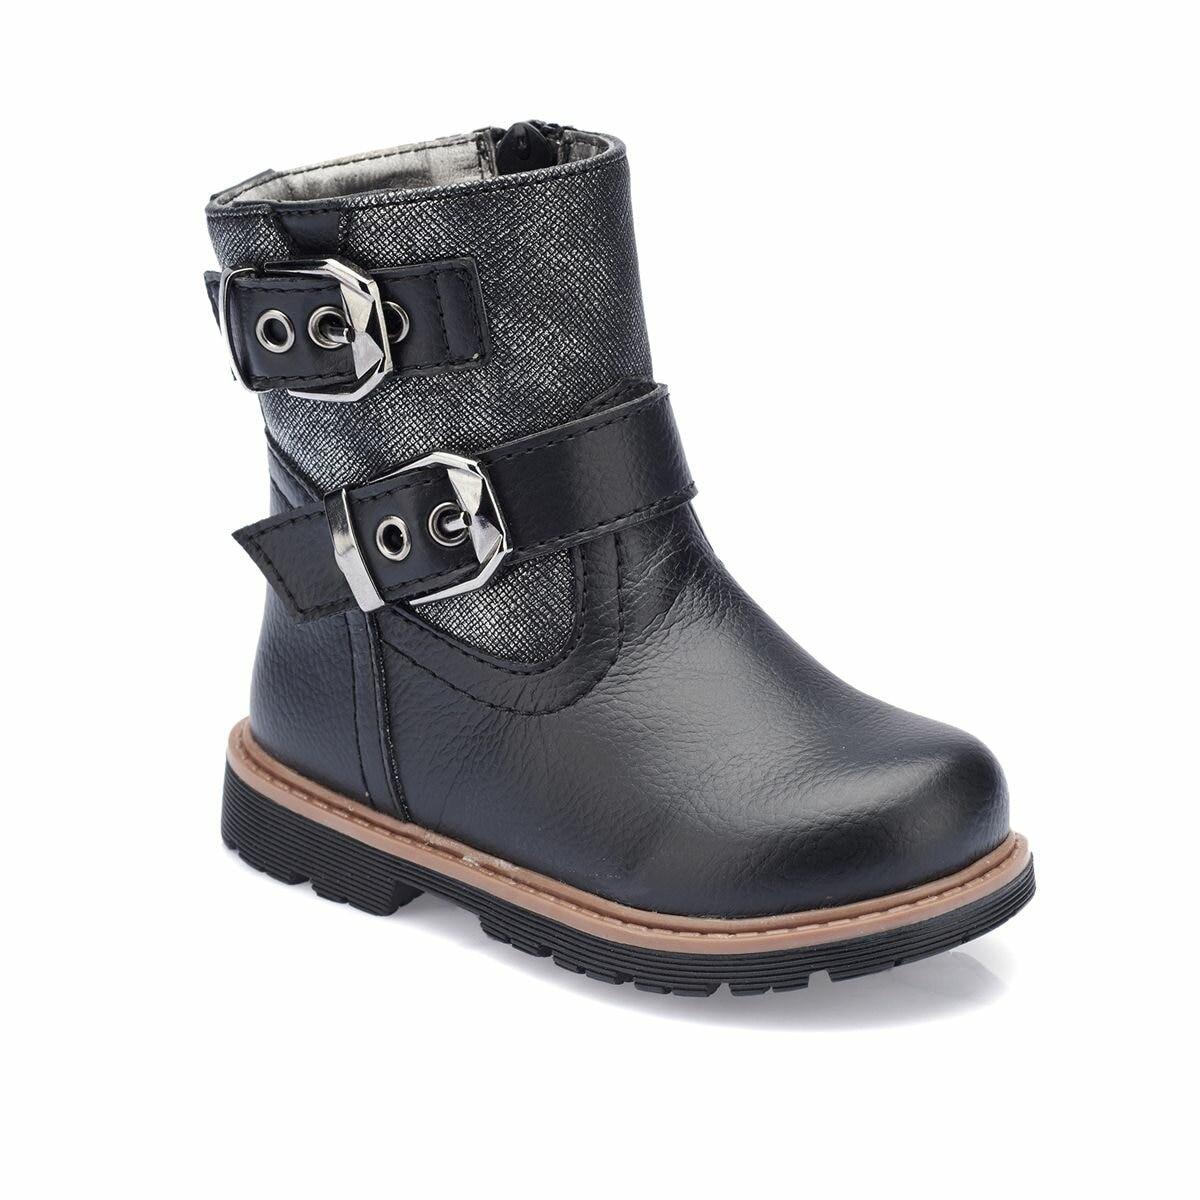 FLO 82. 510522.B Black Female Child Boots Polaris